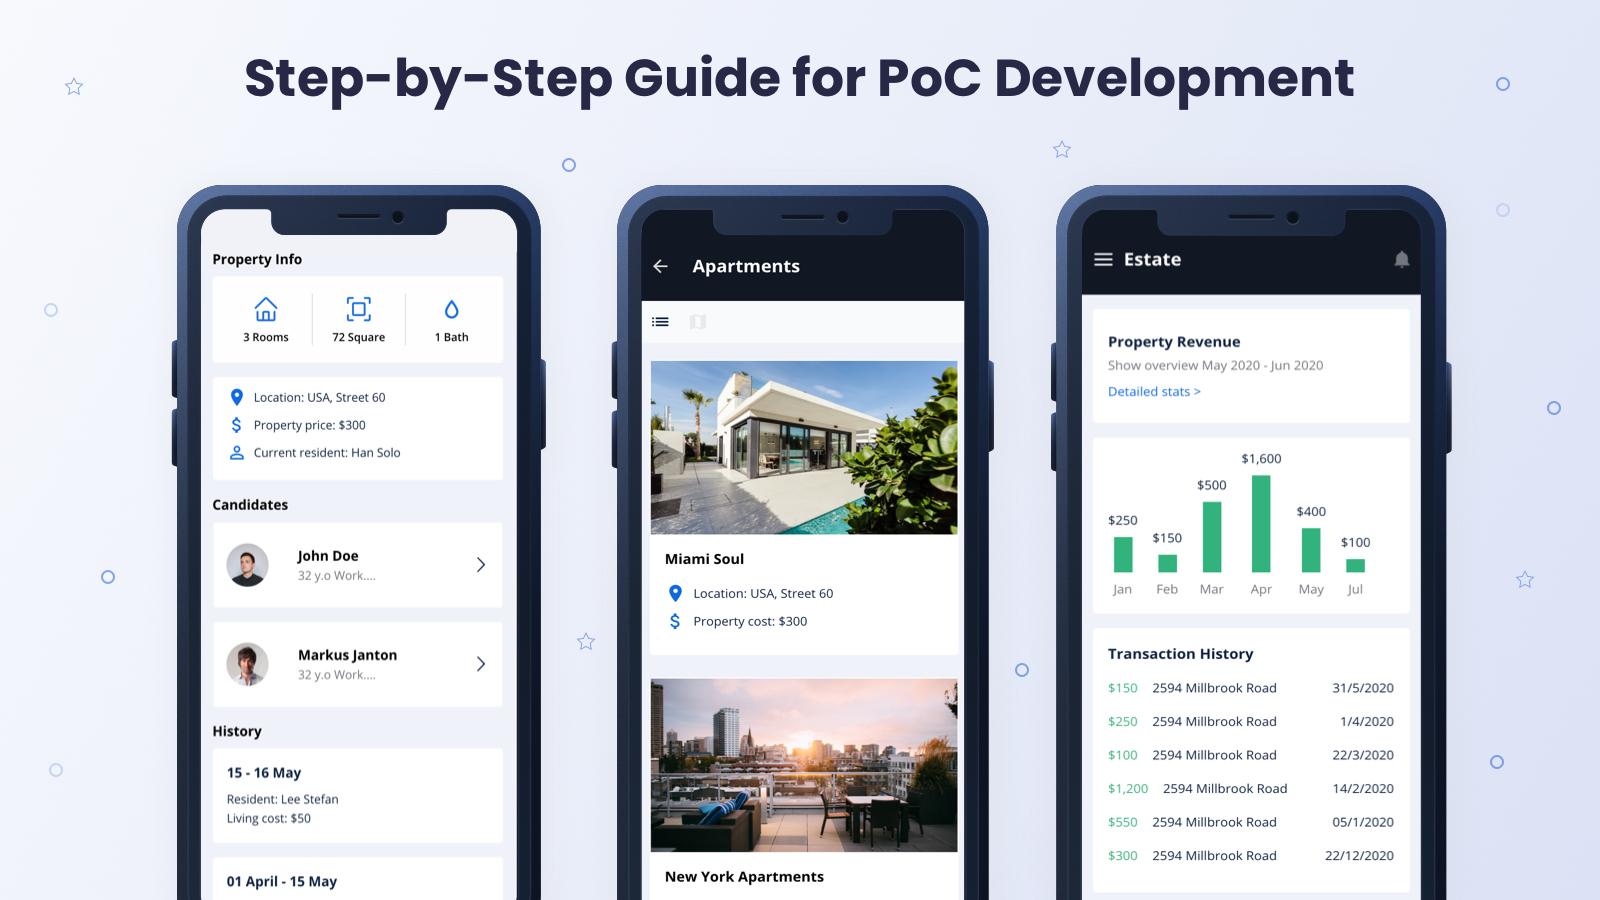 PoC Development Steps: Guide Based on Building a Mobile App for Real Estate